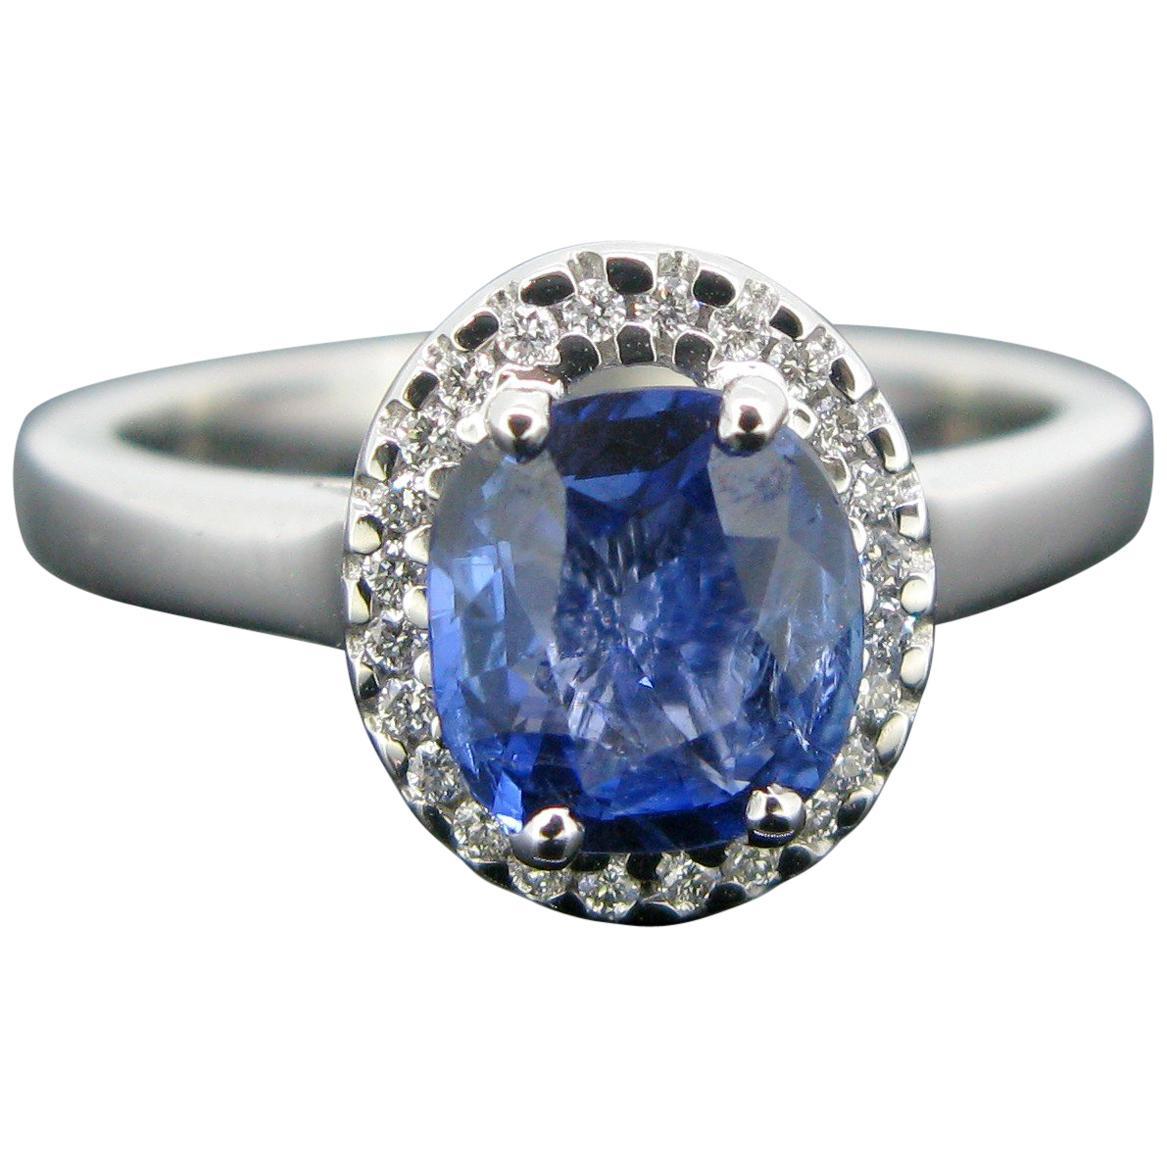 Cushion Ceylon Sapphire Certified Diamond Cluster Band Ring